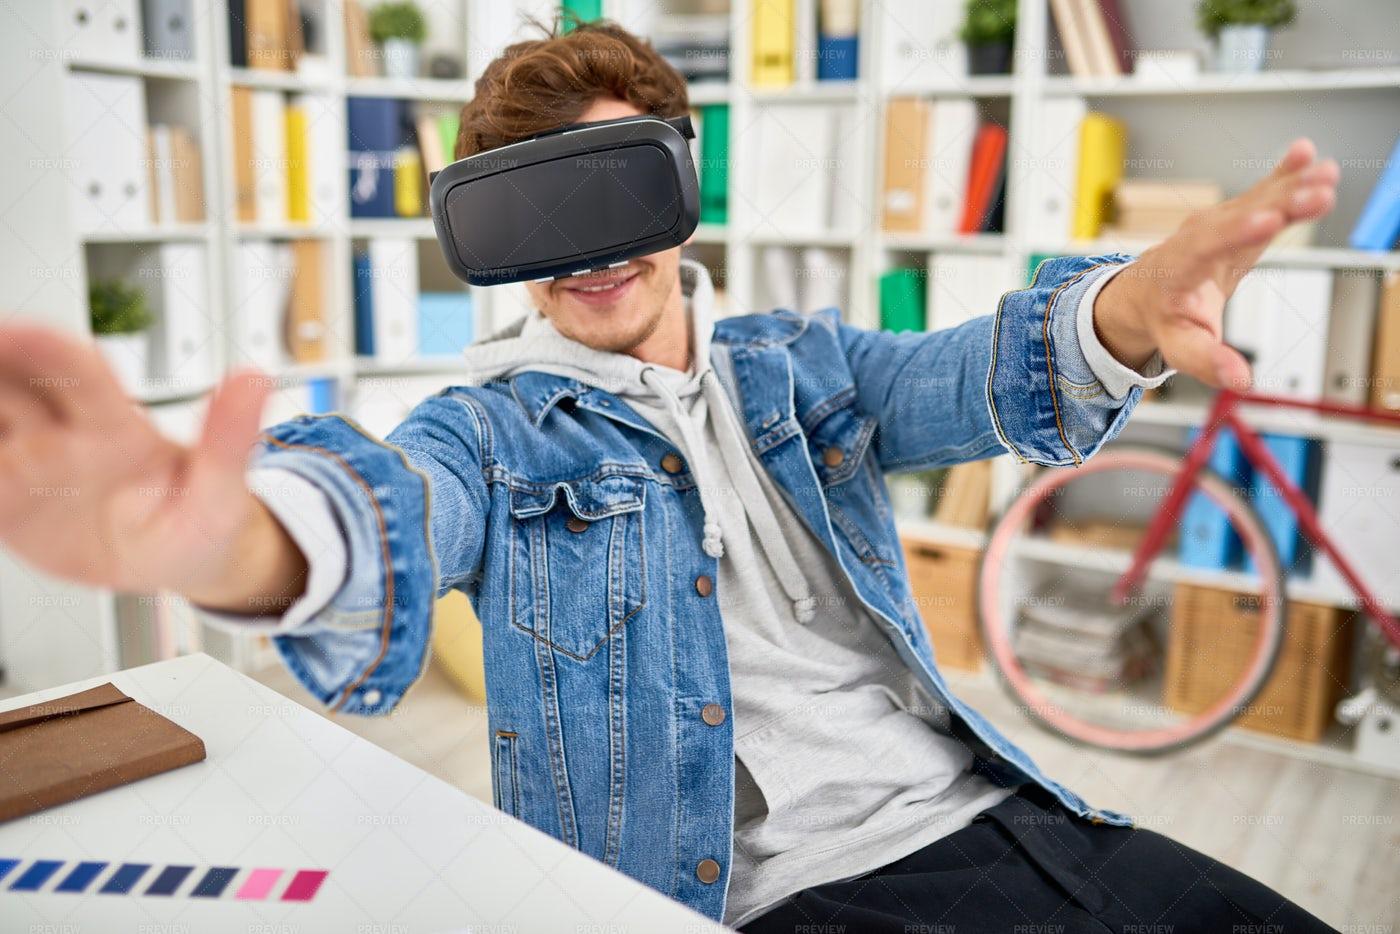 VR Experience: Stock Photos